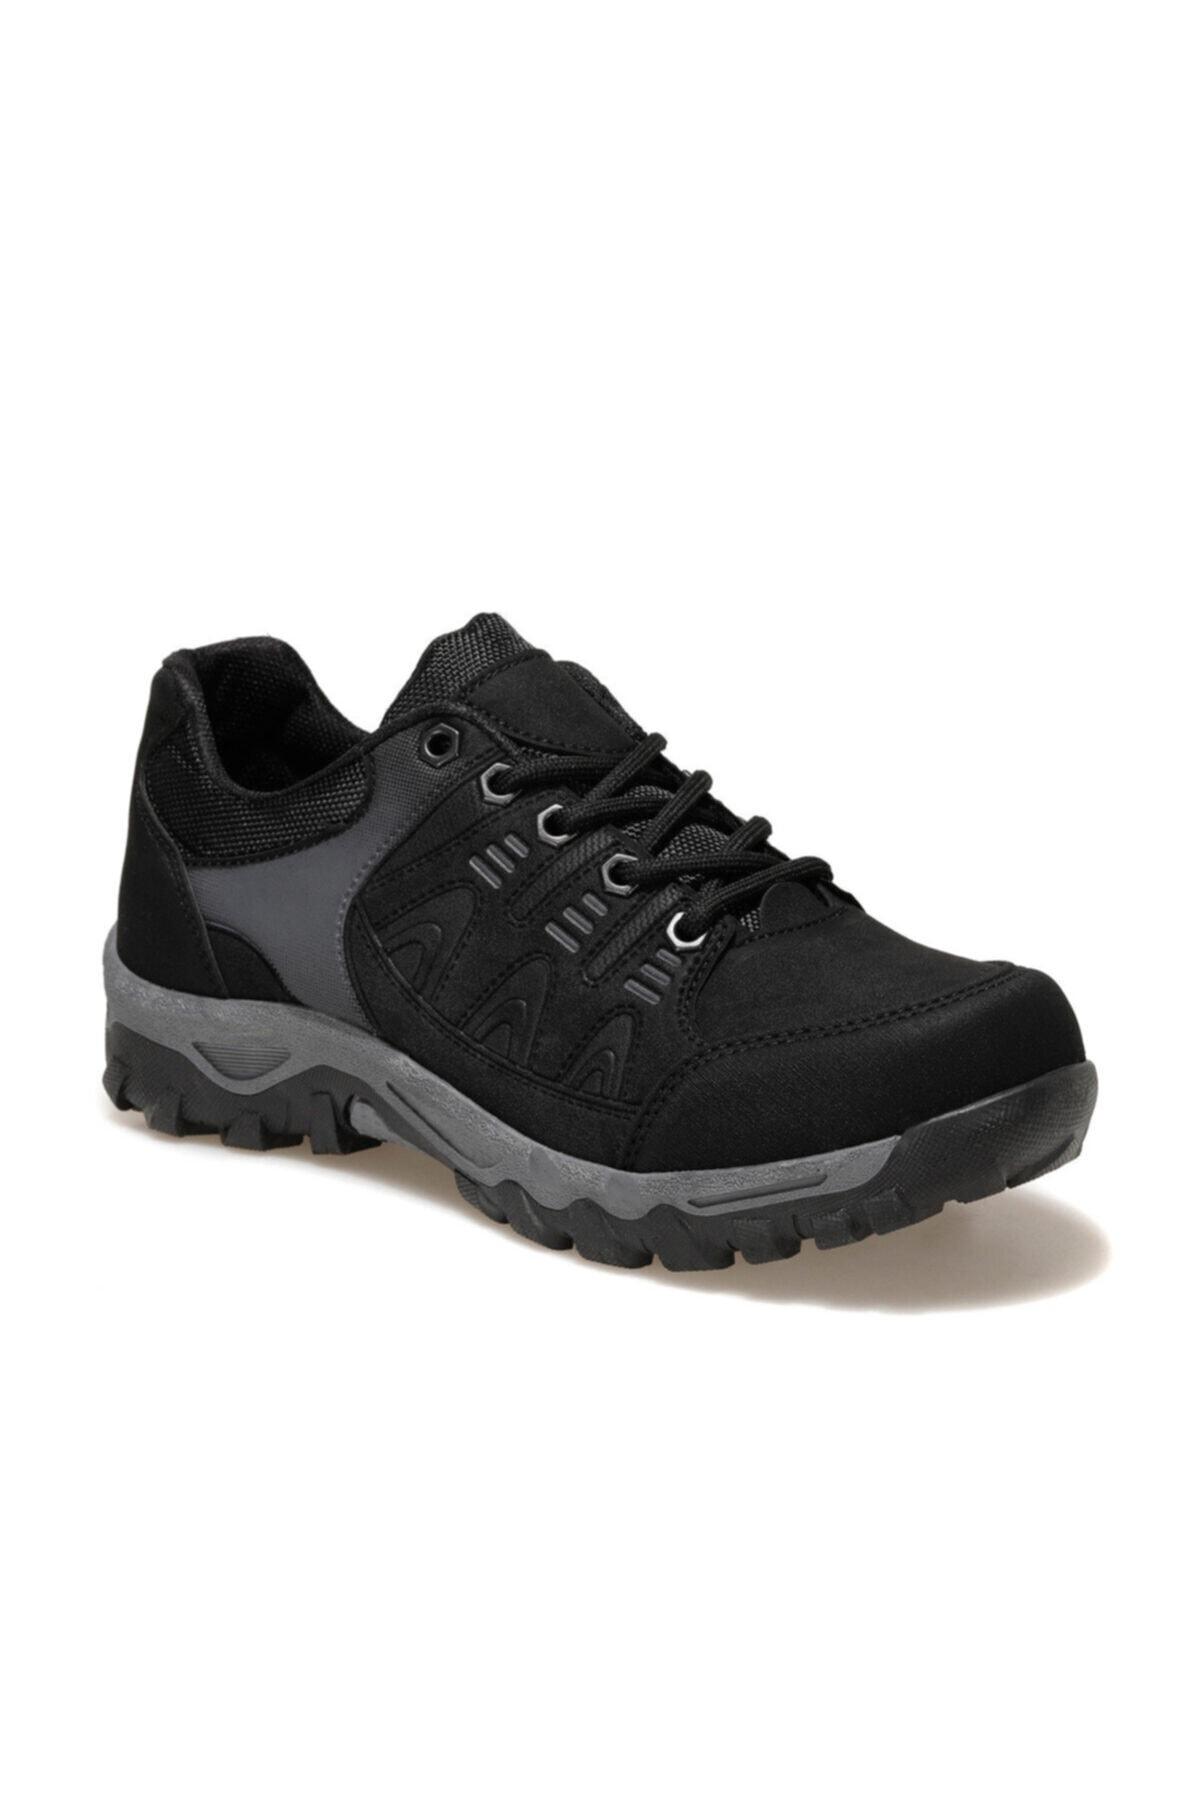 SHAKE Siyah Erkek Outdoor Ayakkabı 101015164